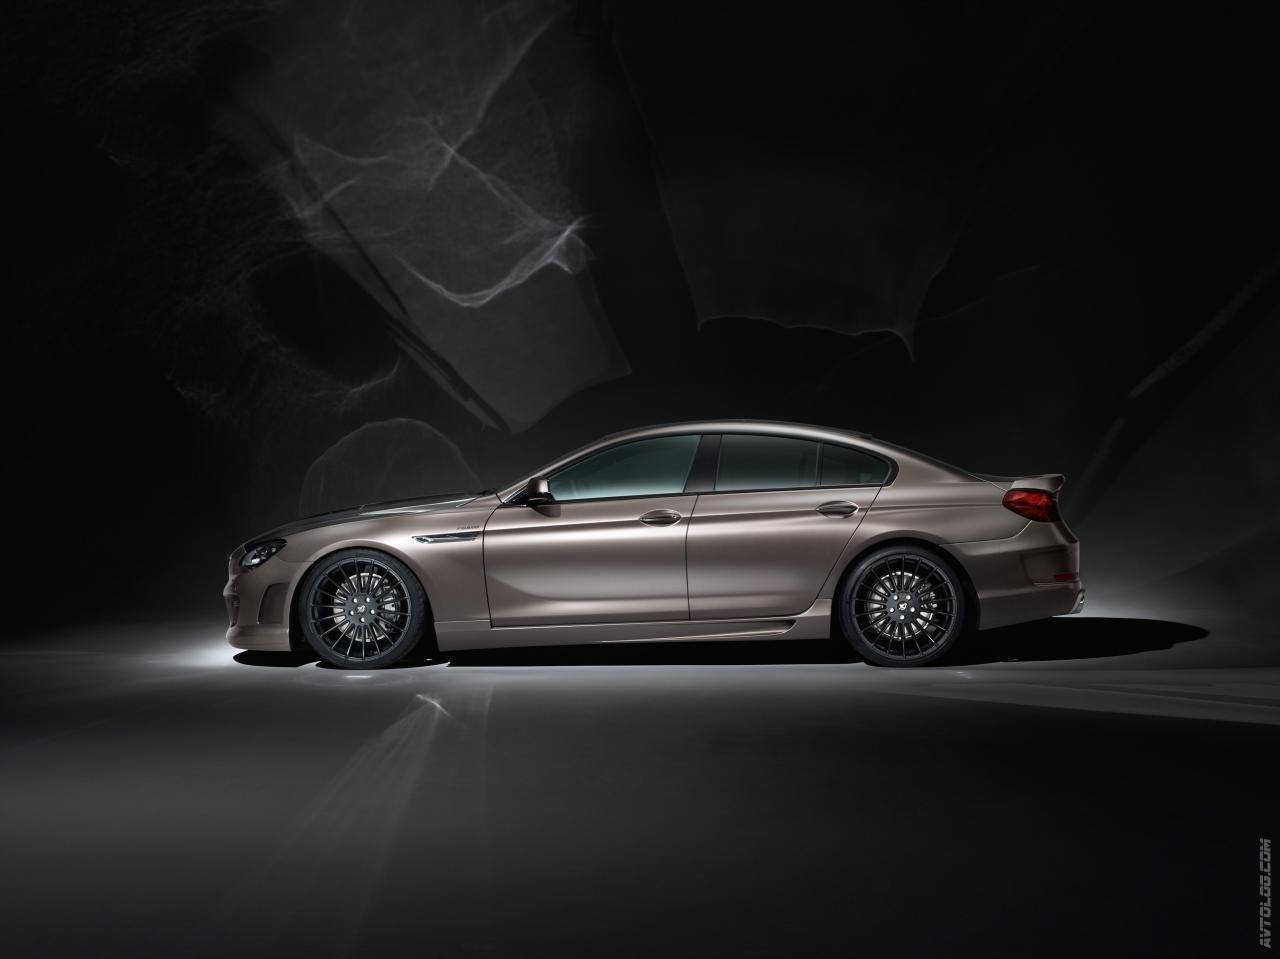 2012 Hamann BMW 6-series Gran Coupé (F06)